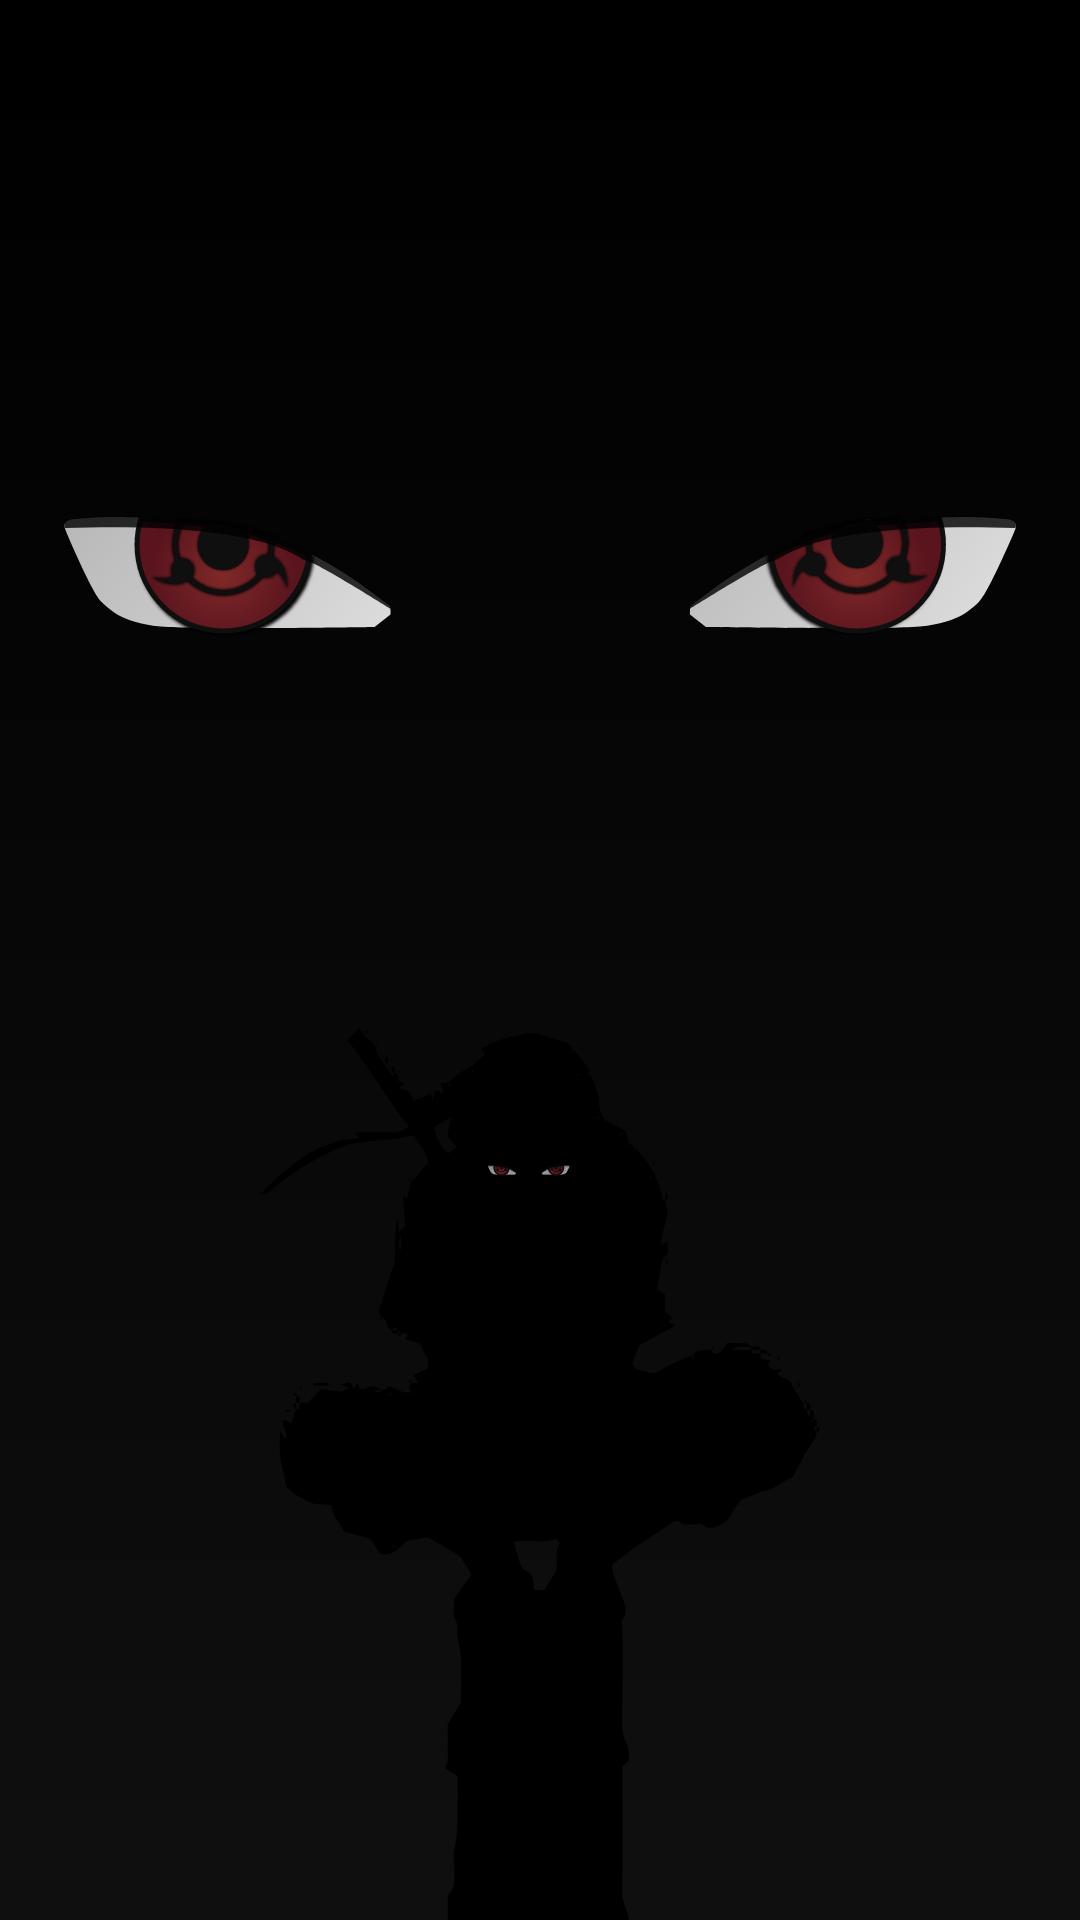 Sharingan - Itachi Uchiha - Naruto - Anime